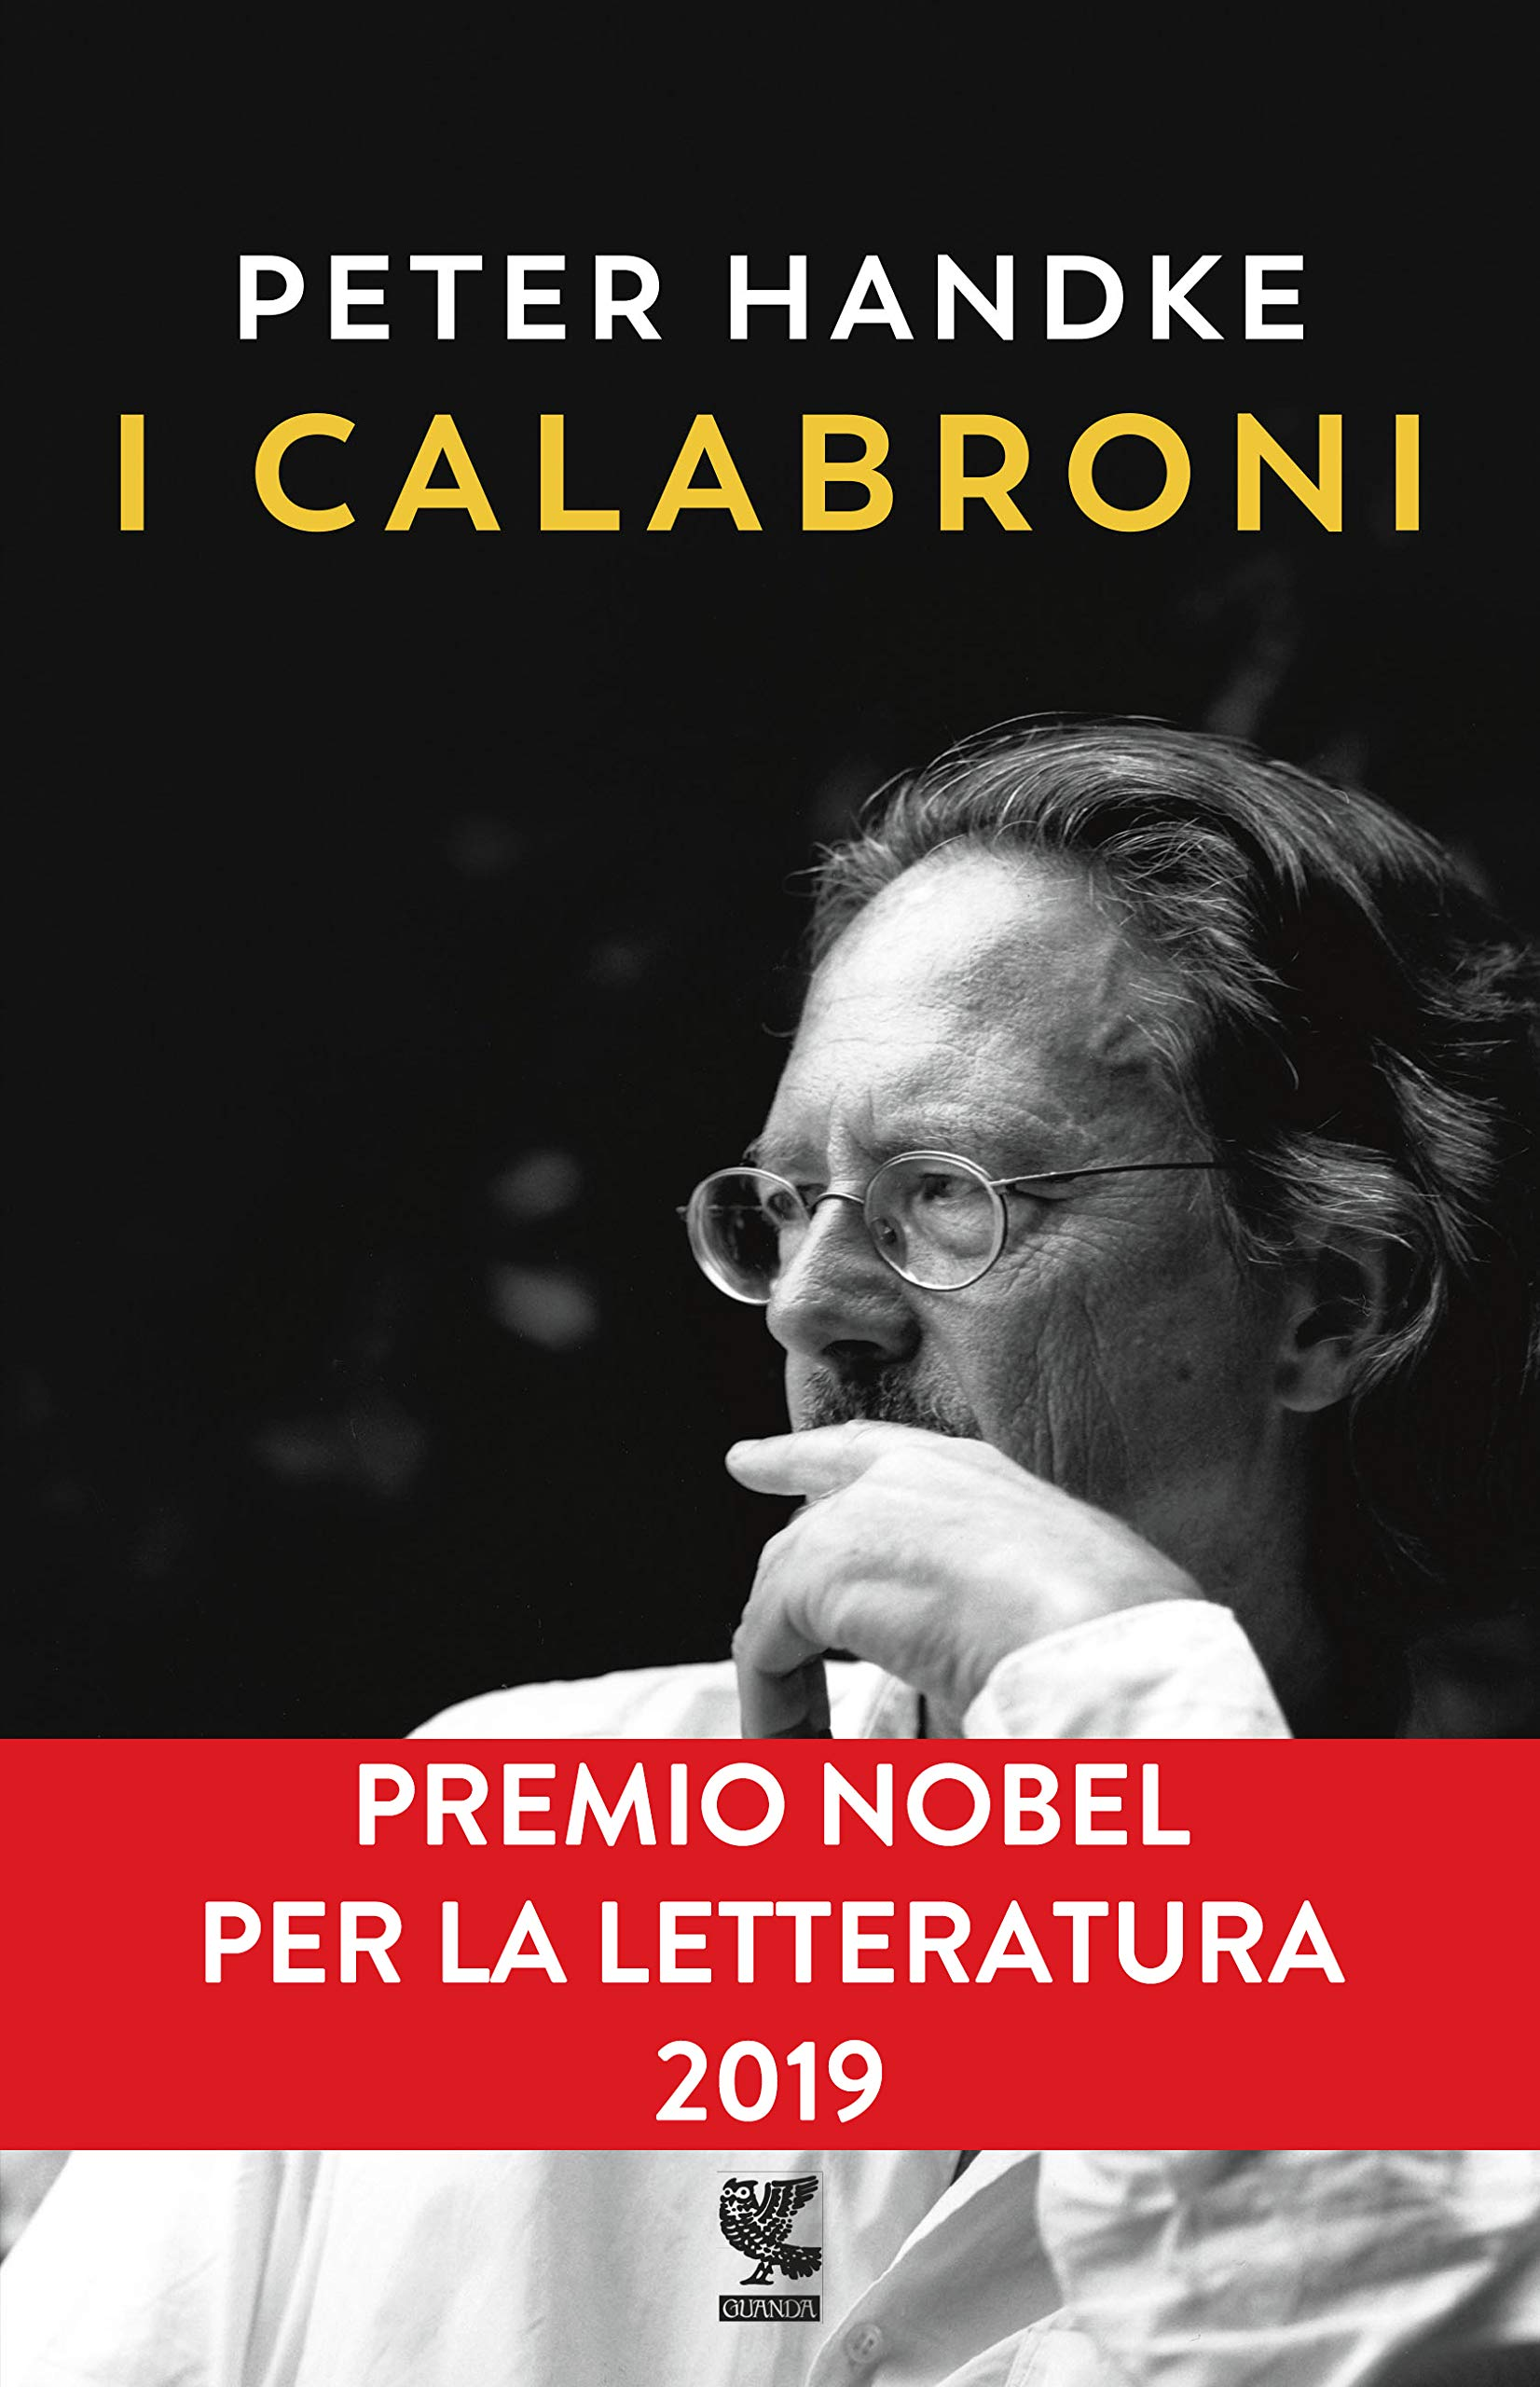 I calabroni (Narratori della Fenice): Amazon.es: Handke, Peter, Bianchi, B. R.: Libros en idiomas extranjeros